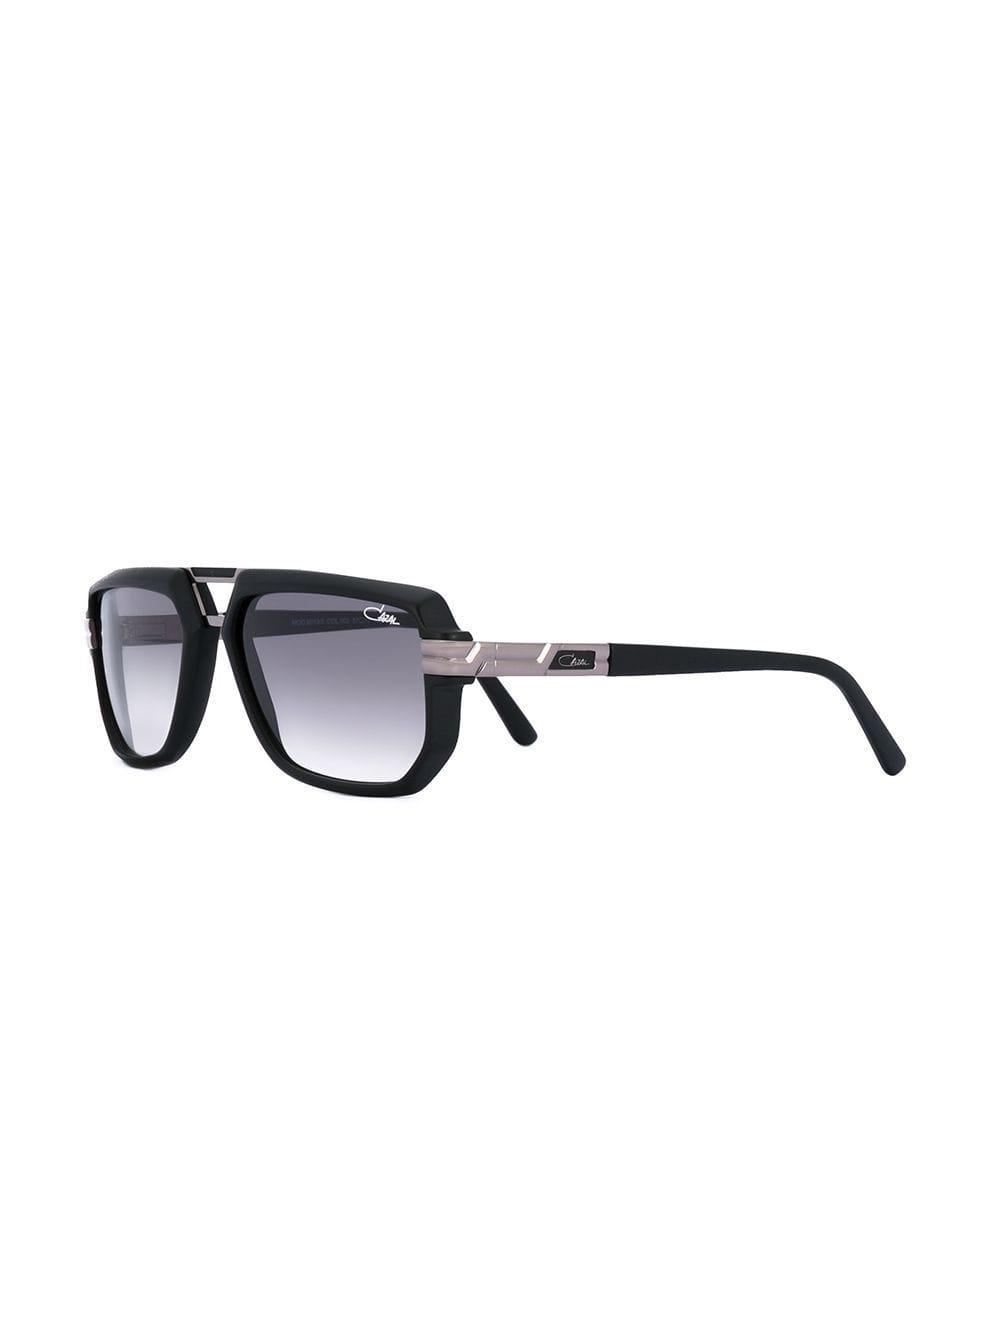 65fac5bc3a1 Cazal - Black Rectangle Frame Sunglasses for Men - Lyst. View fullscreen